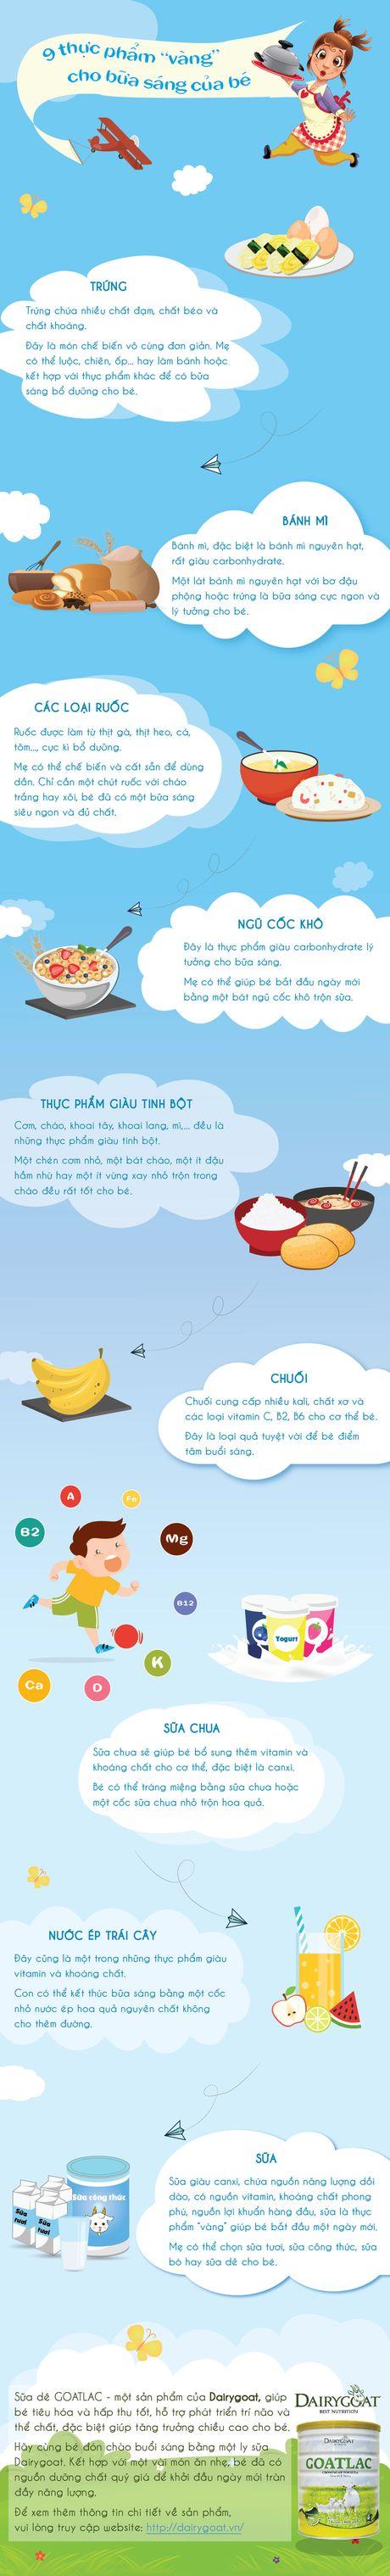 9 thuc pham 'vang' cho bua sang cua be - Anh 1